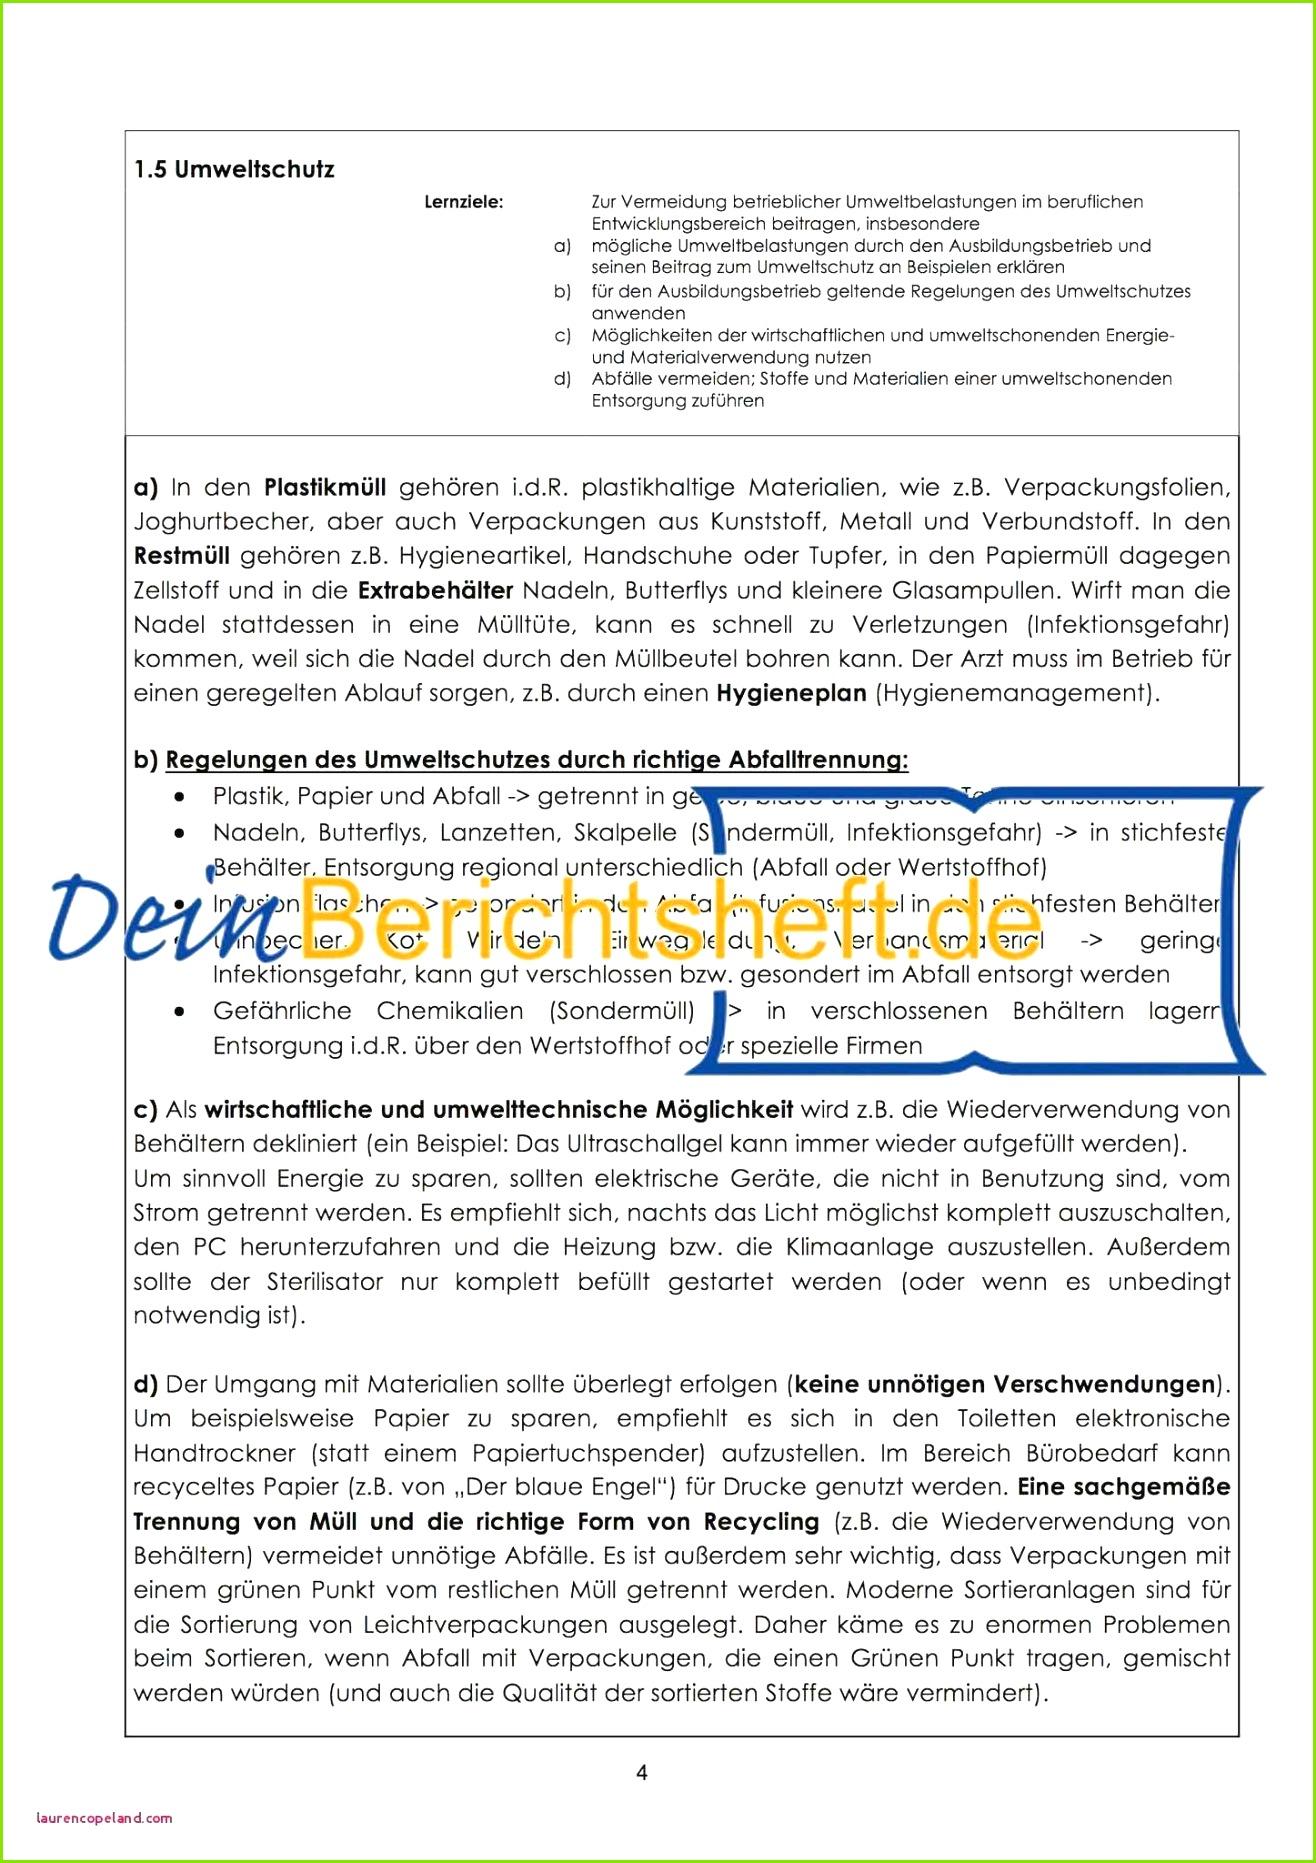 Praktikum Muster Neu Kundigung Wegen Umzug Vorlage 12 Deckblatt Praktikum Kindergarten